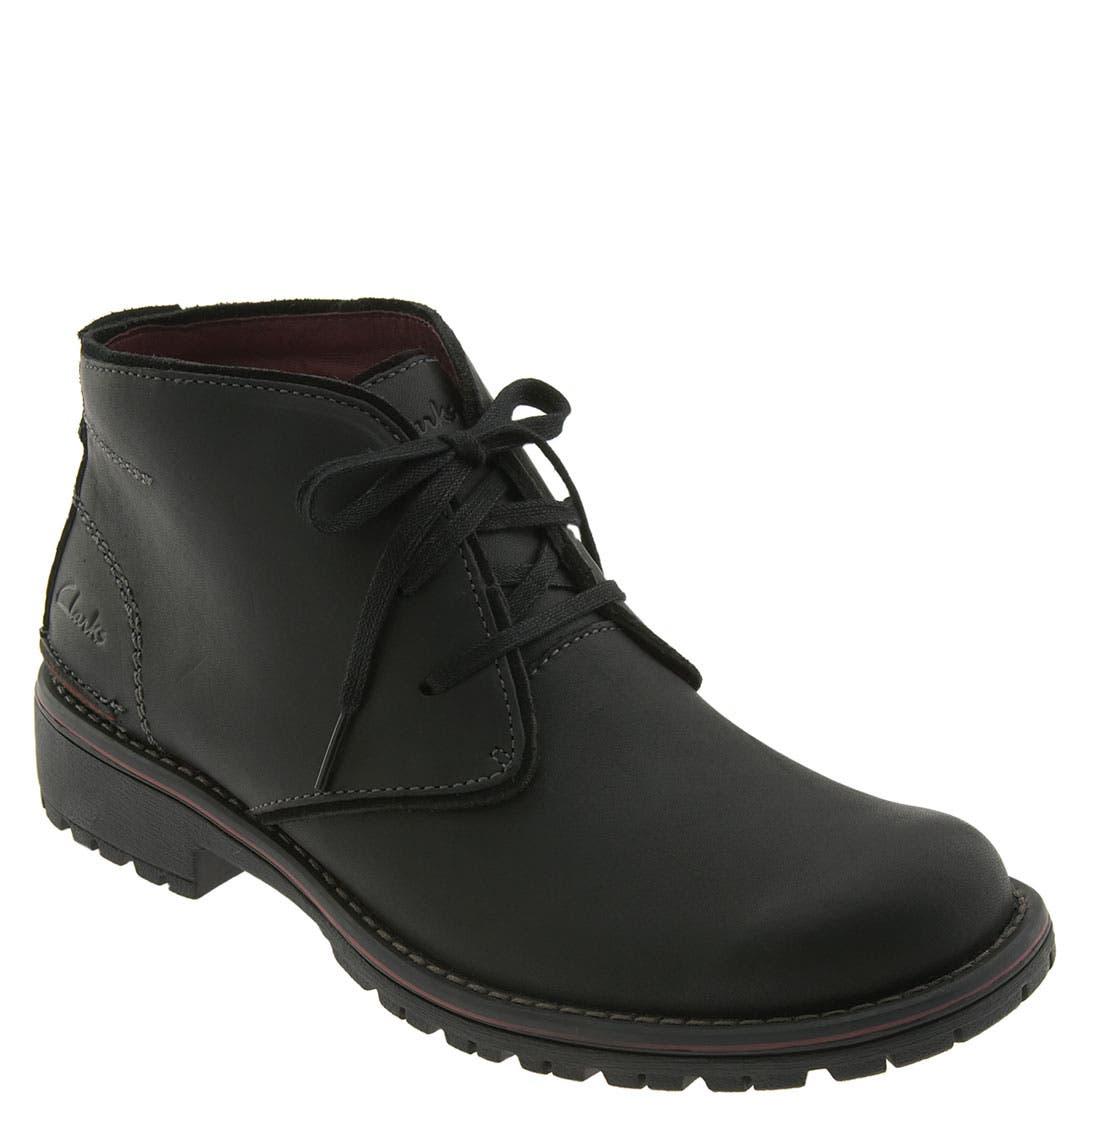 CLARKS<SUP>®</SUP> 'Roar' Chukka Boot, Main, color, 005